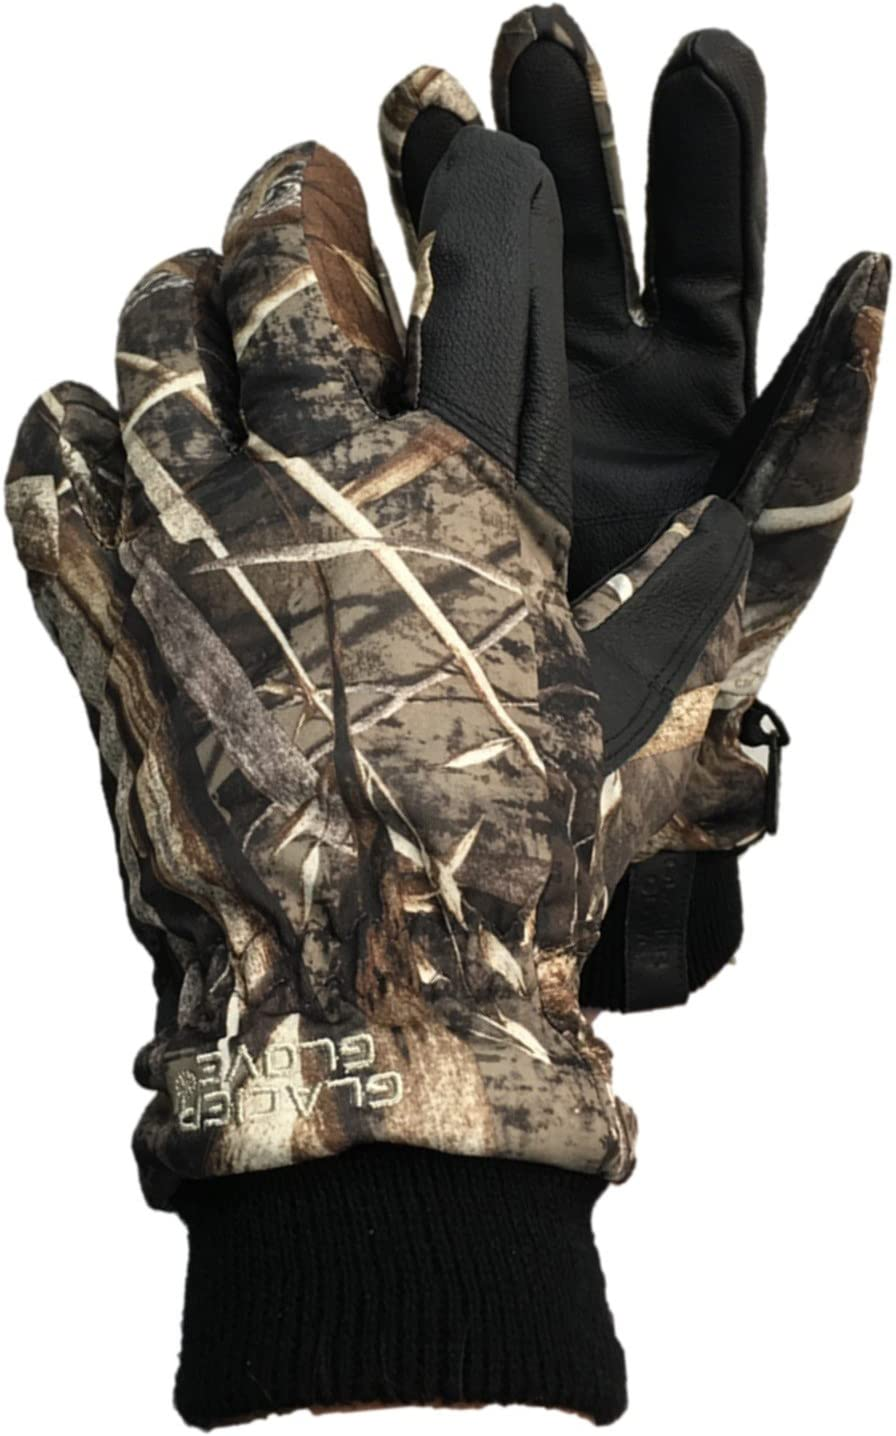 best hunting gloves: Glacier Glove Alaska Pro Waterproof Insulated Glove